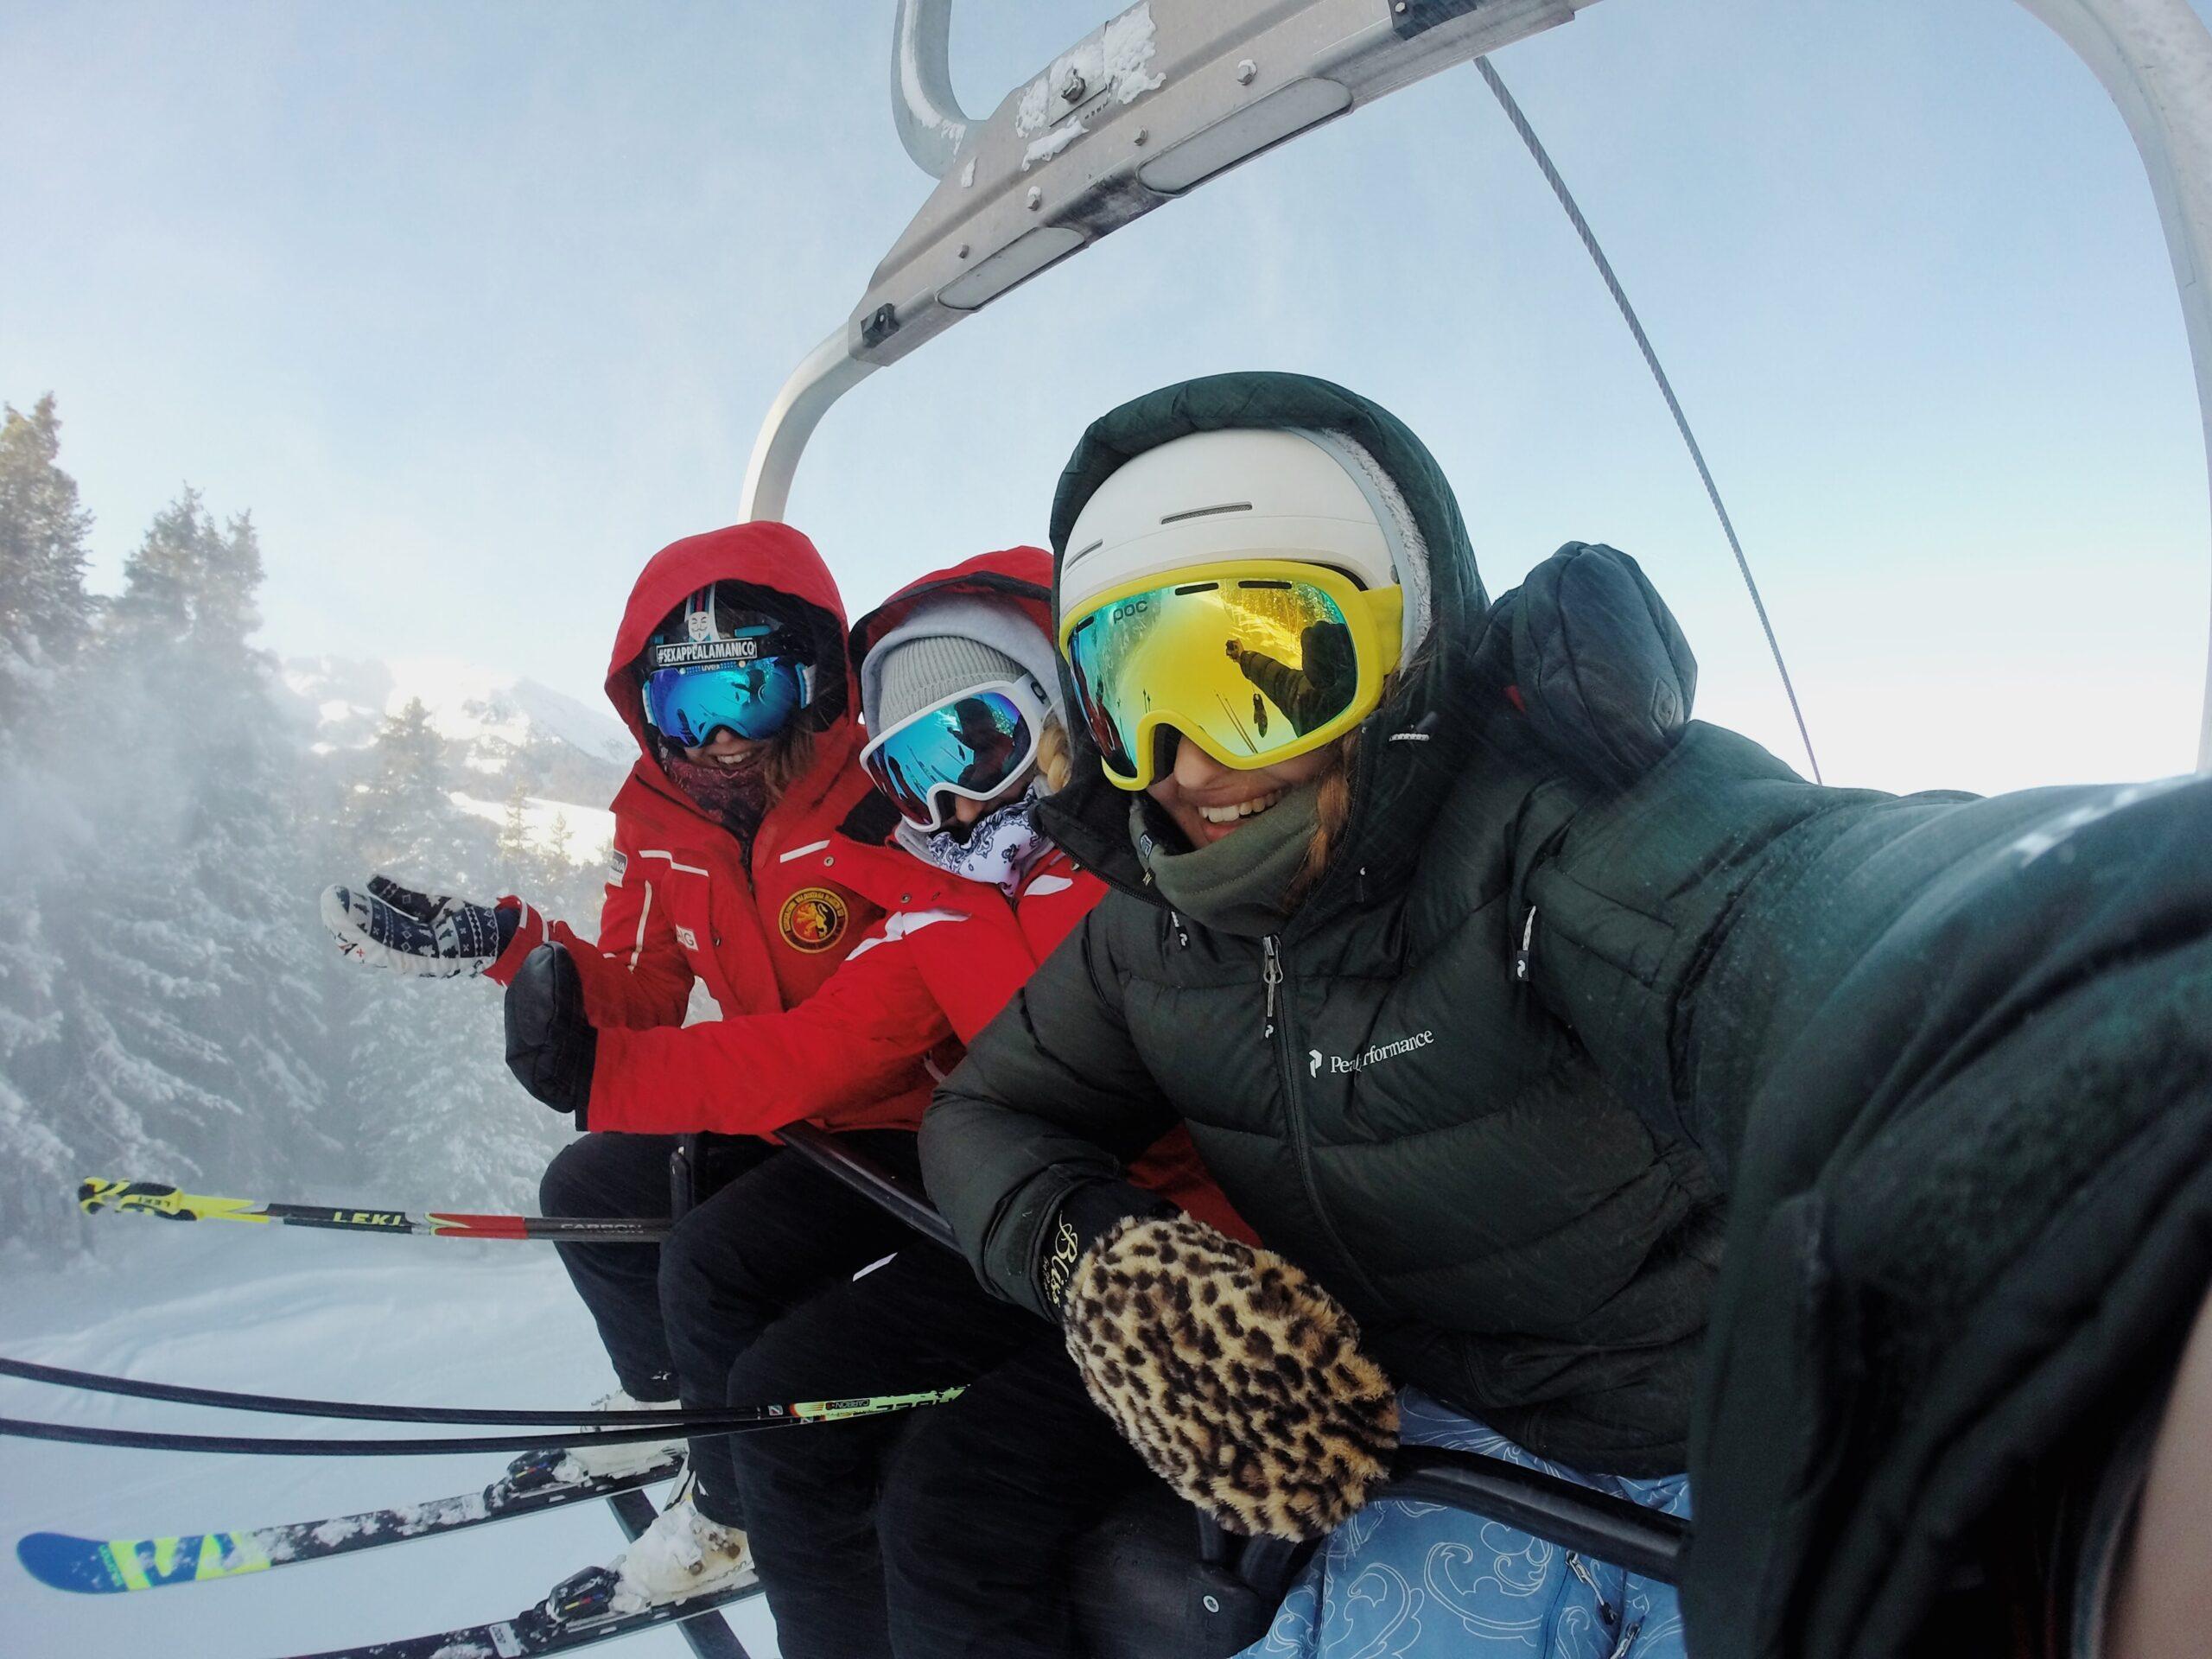 Amigos practicando esquí